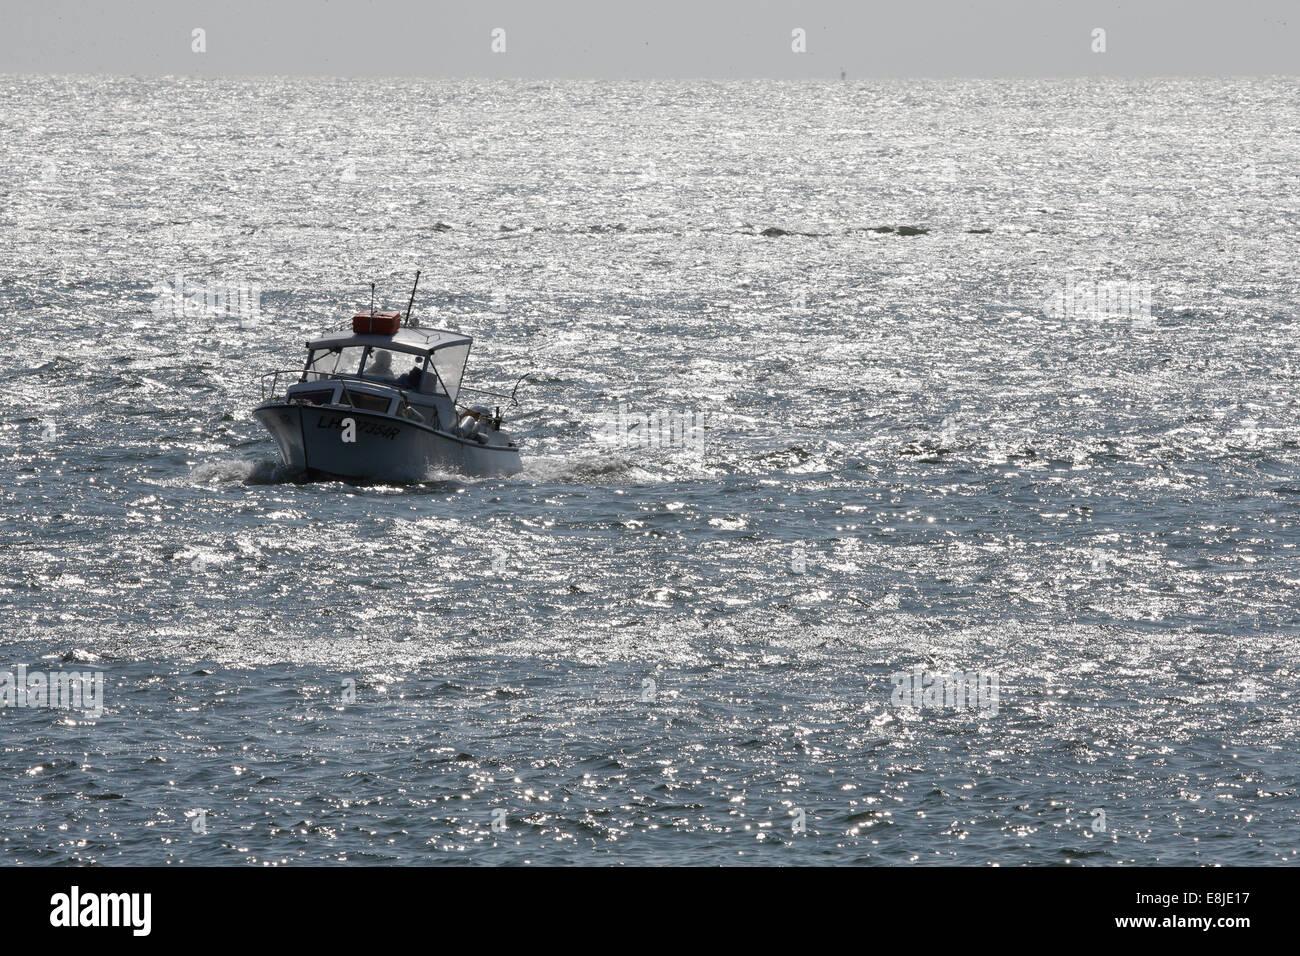 Yachting. - Stock Image